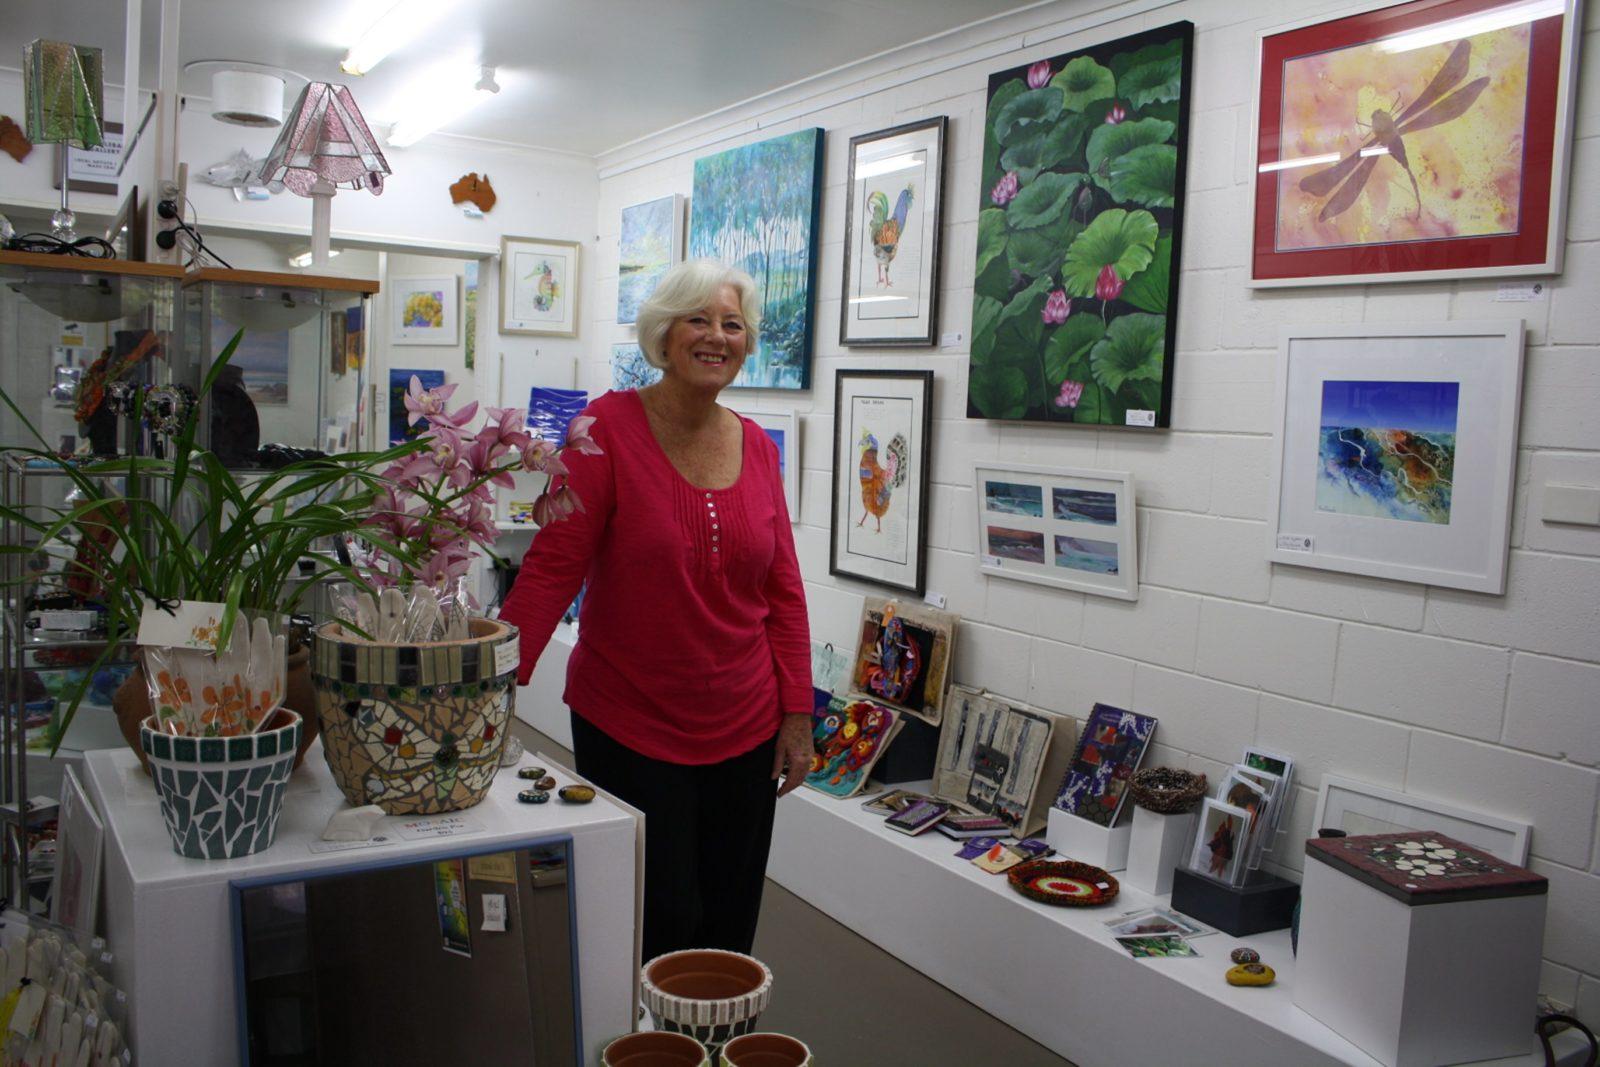 Manger of The Gallery - Laureen Phillips